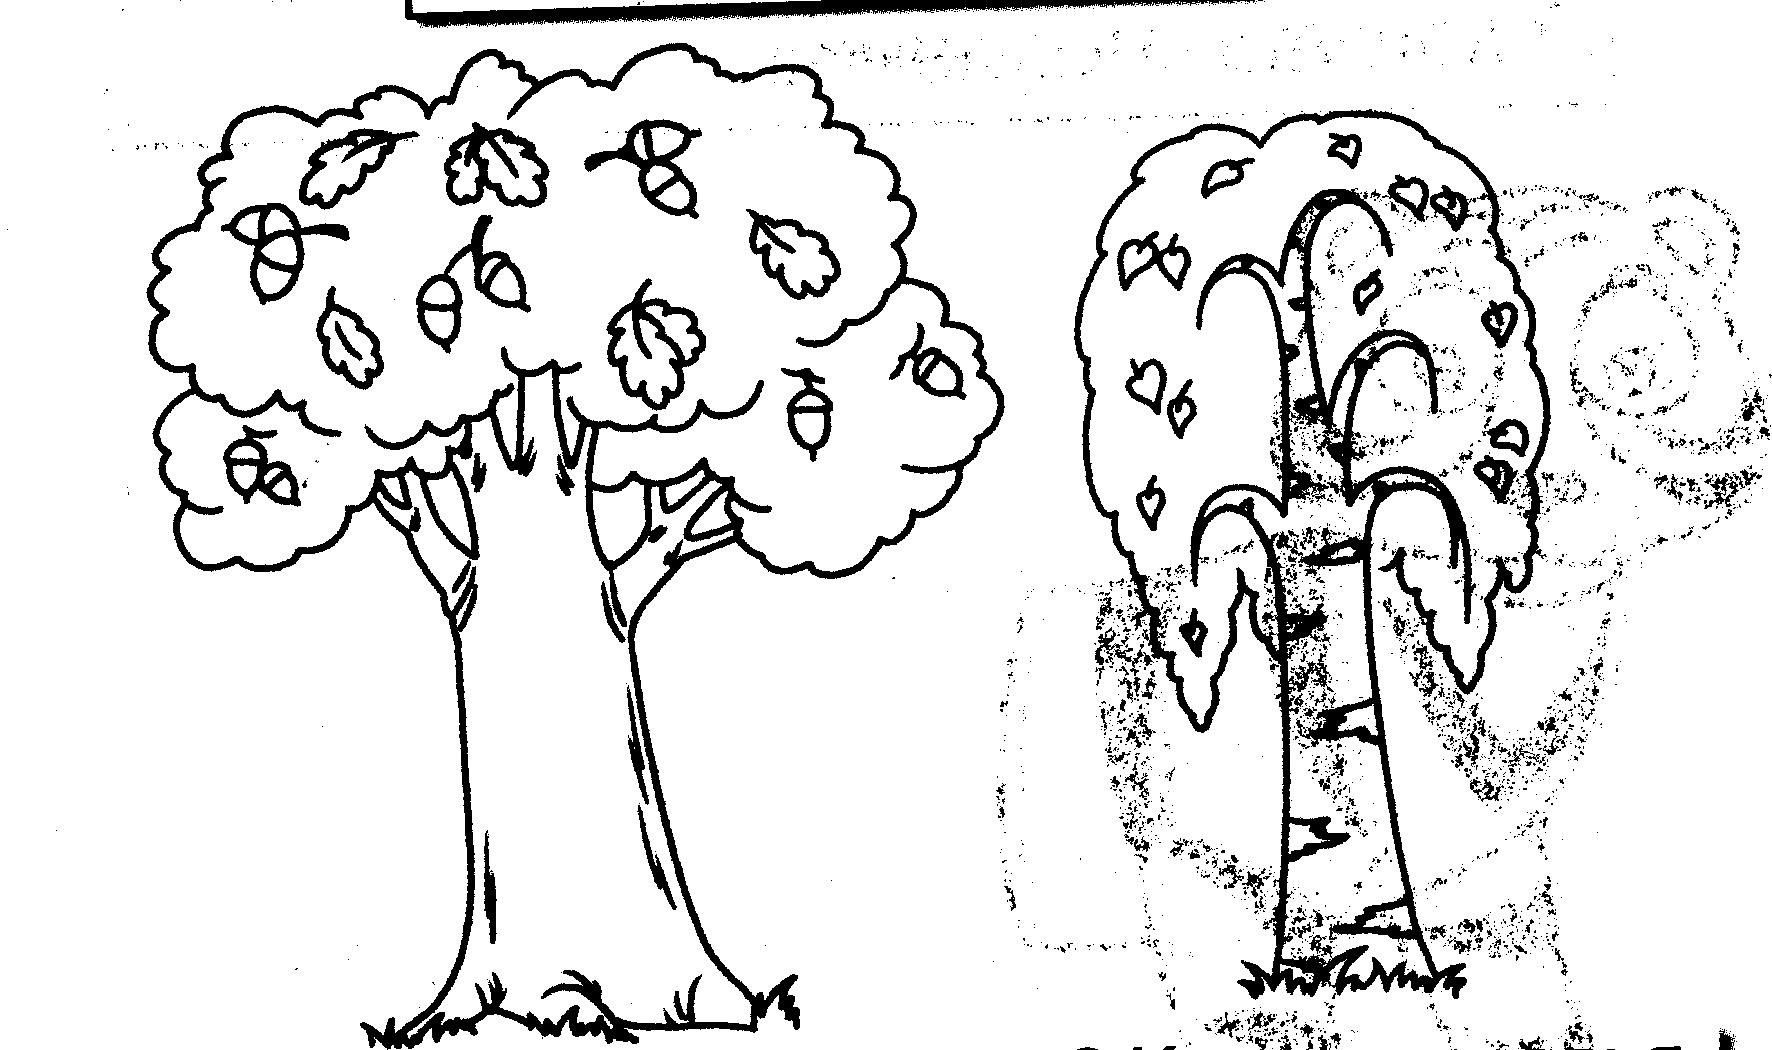 I:\картинки\рисунки\дерево.bmp